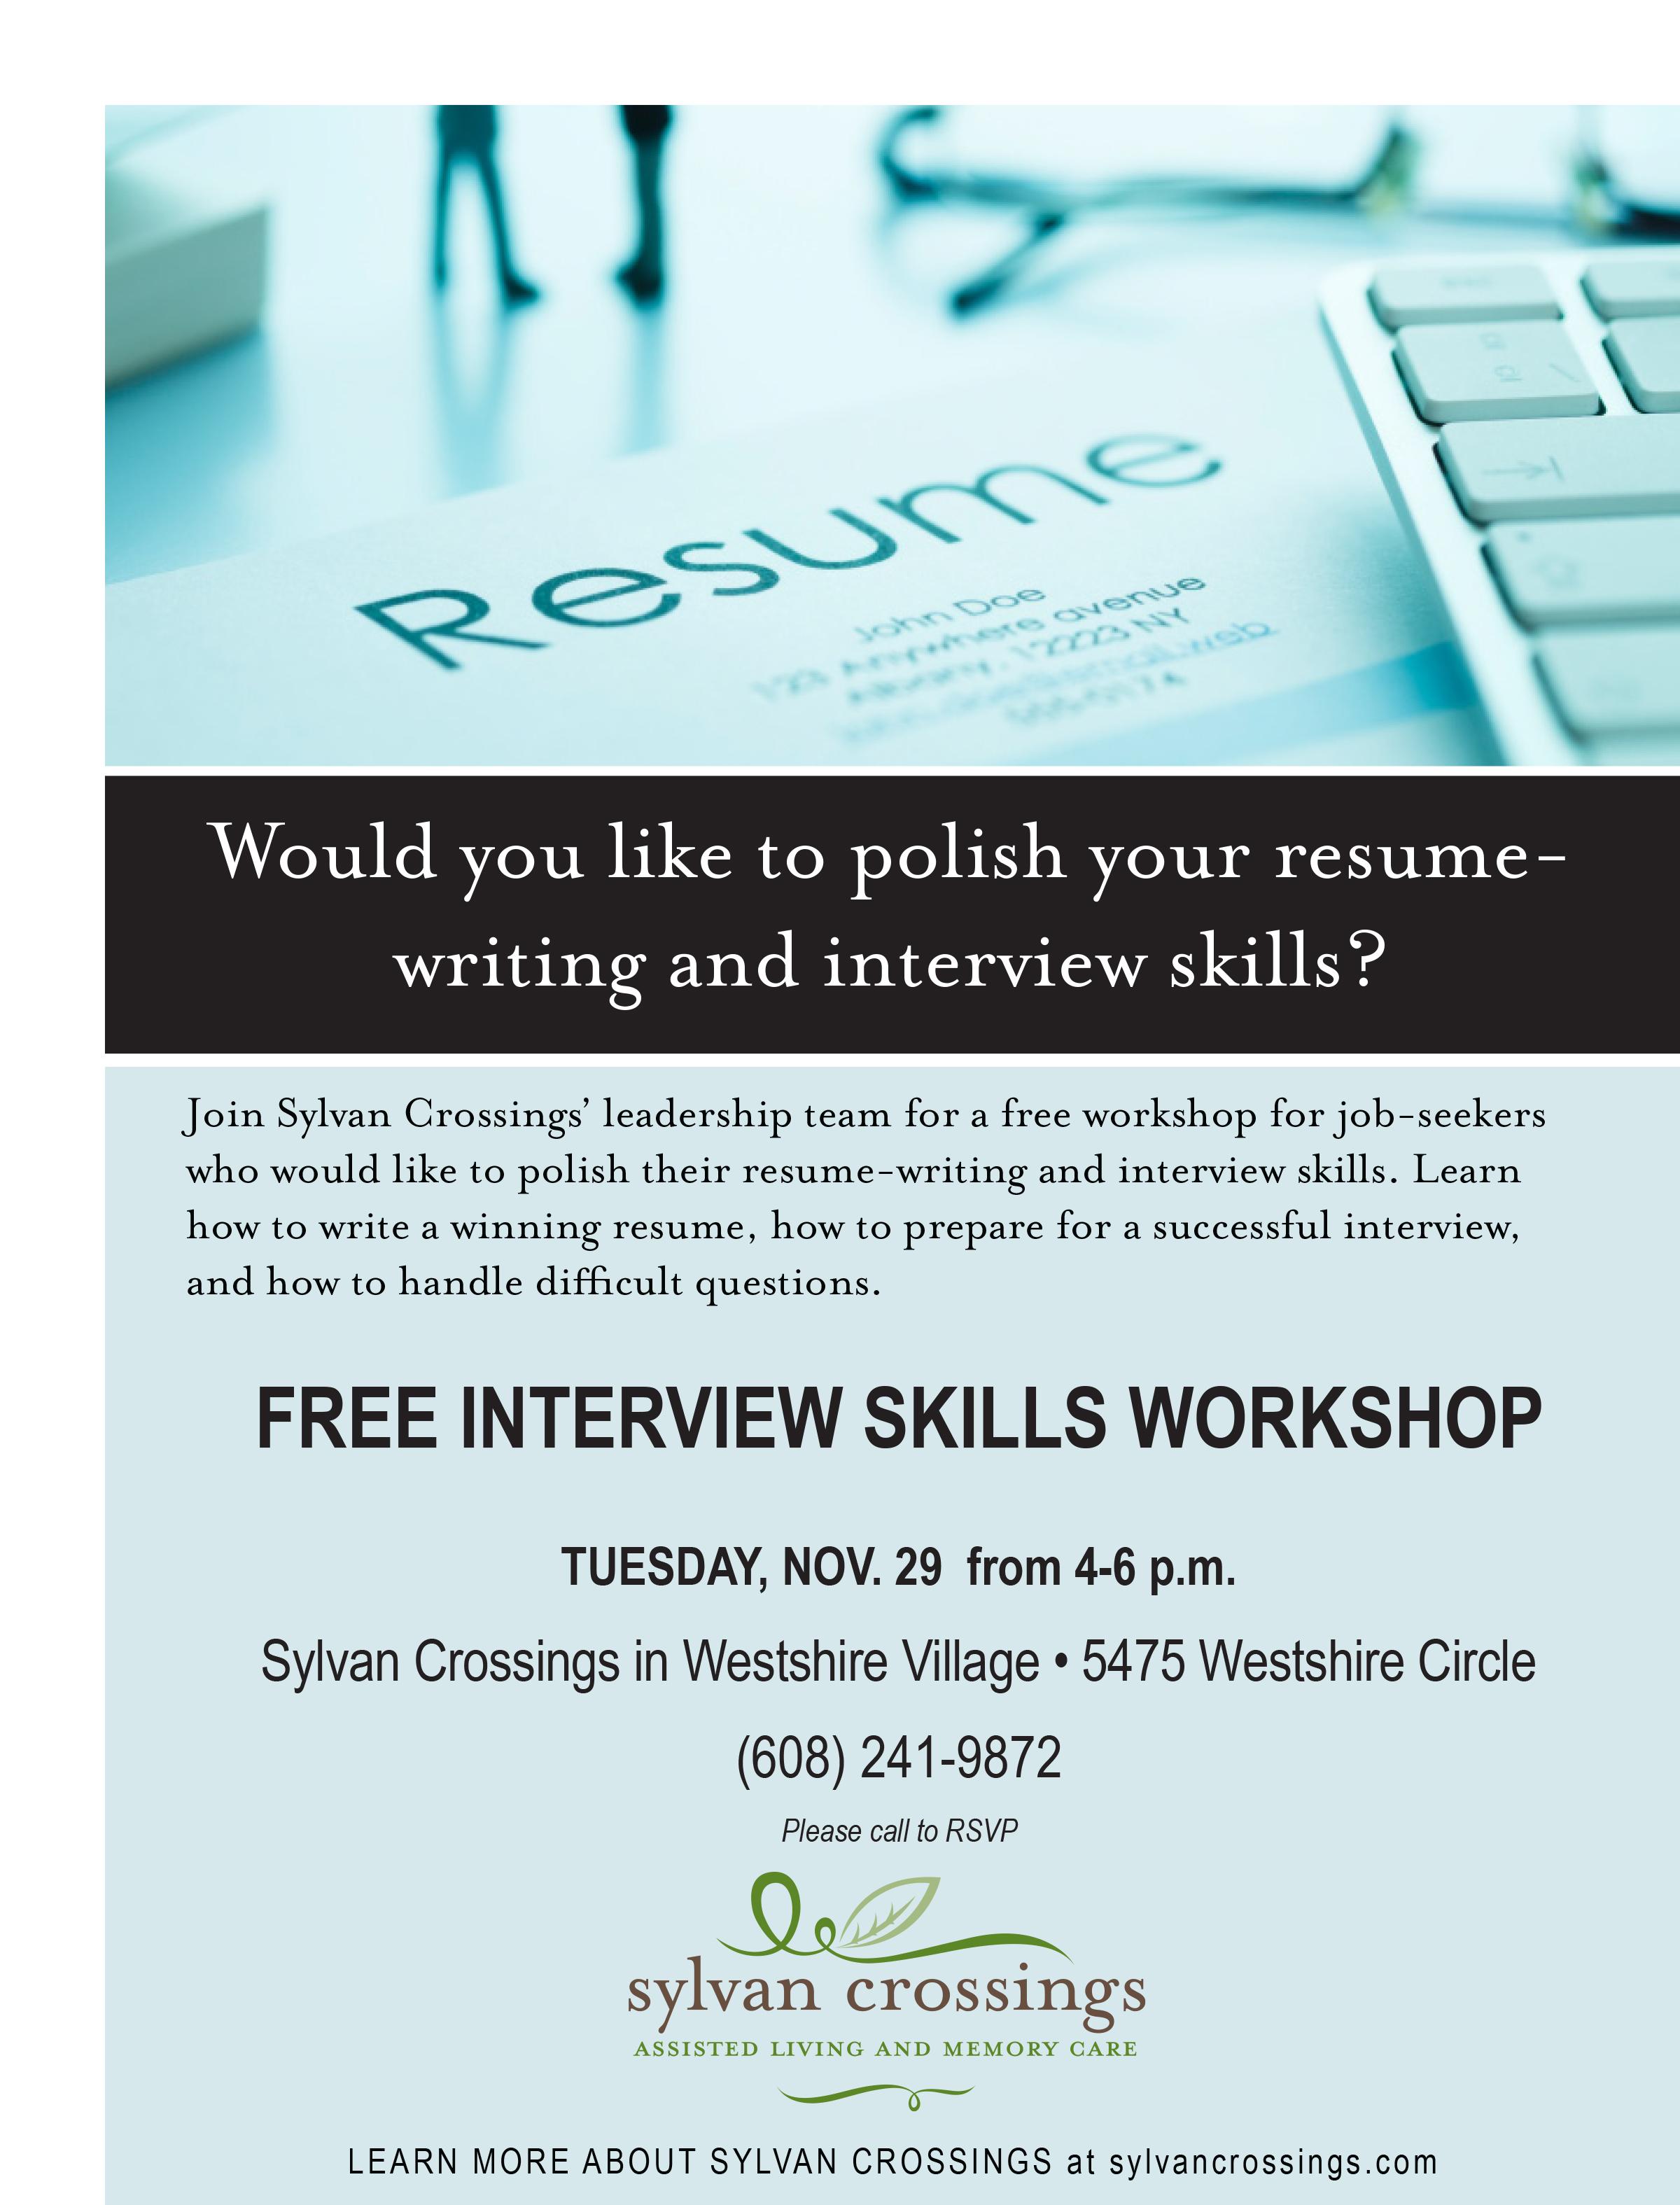 polish your resume-free interview skills workshop